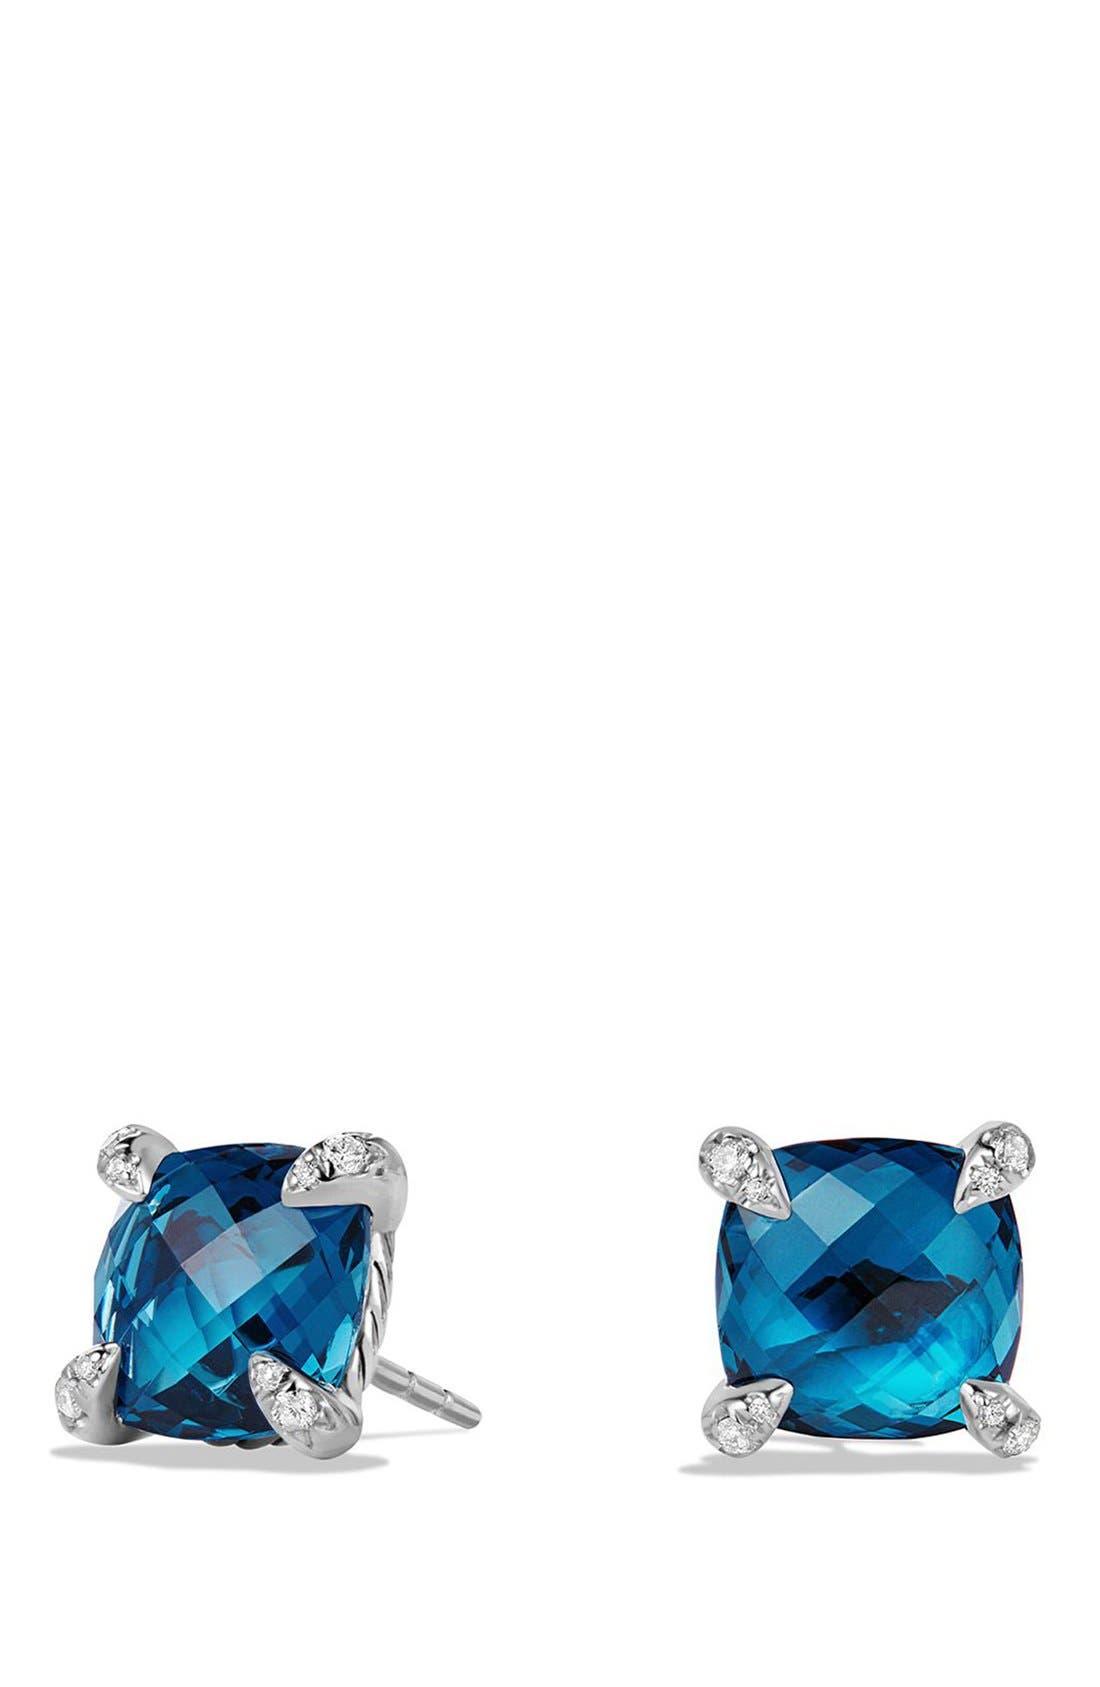 'Châtelaine' Earrings with Semiprecious Stones and Diamonds, Main, color, SILVER/ HAMPTON BLUE TOPAZ